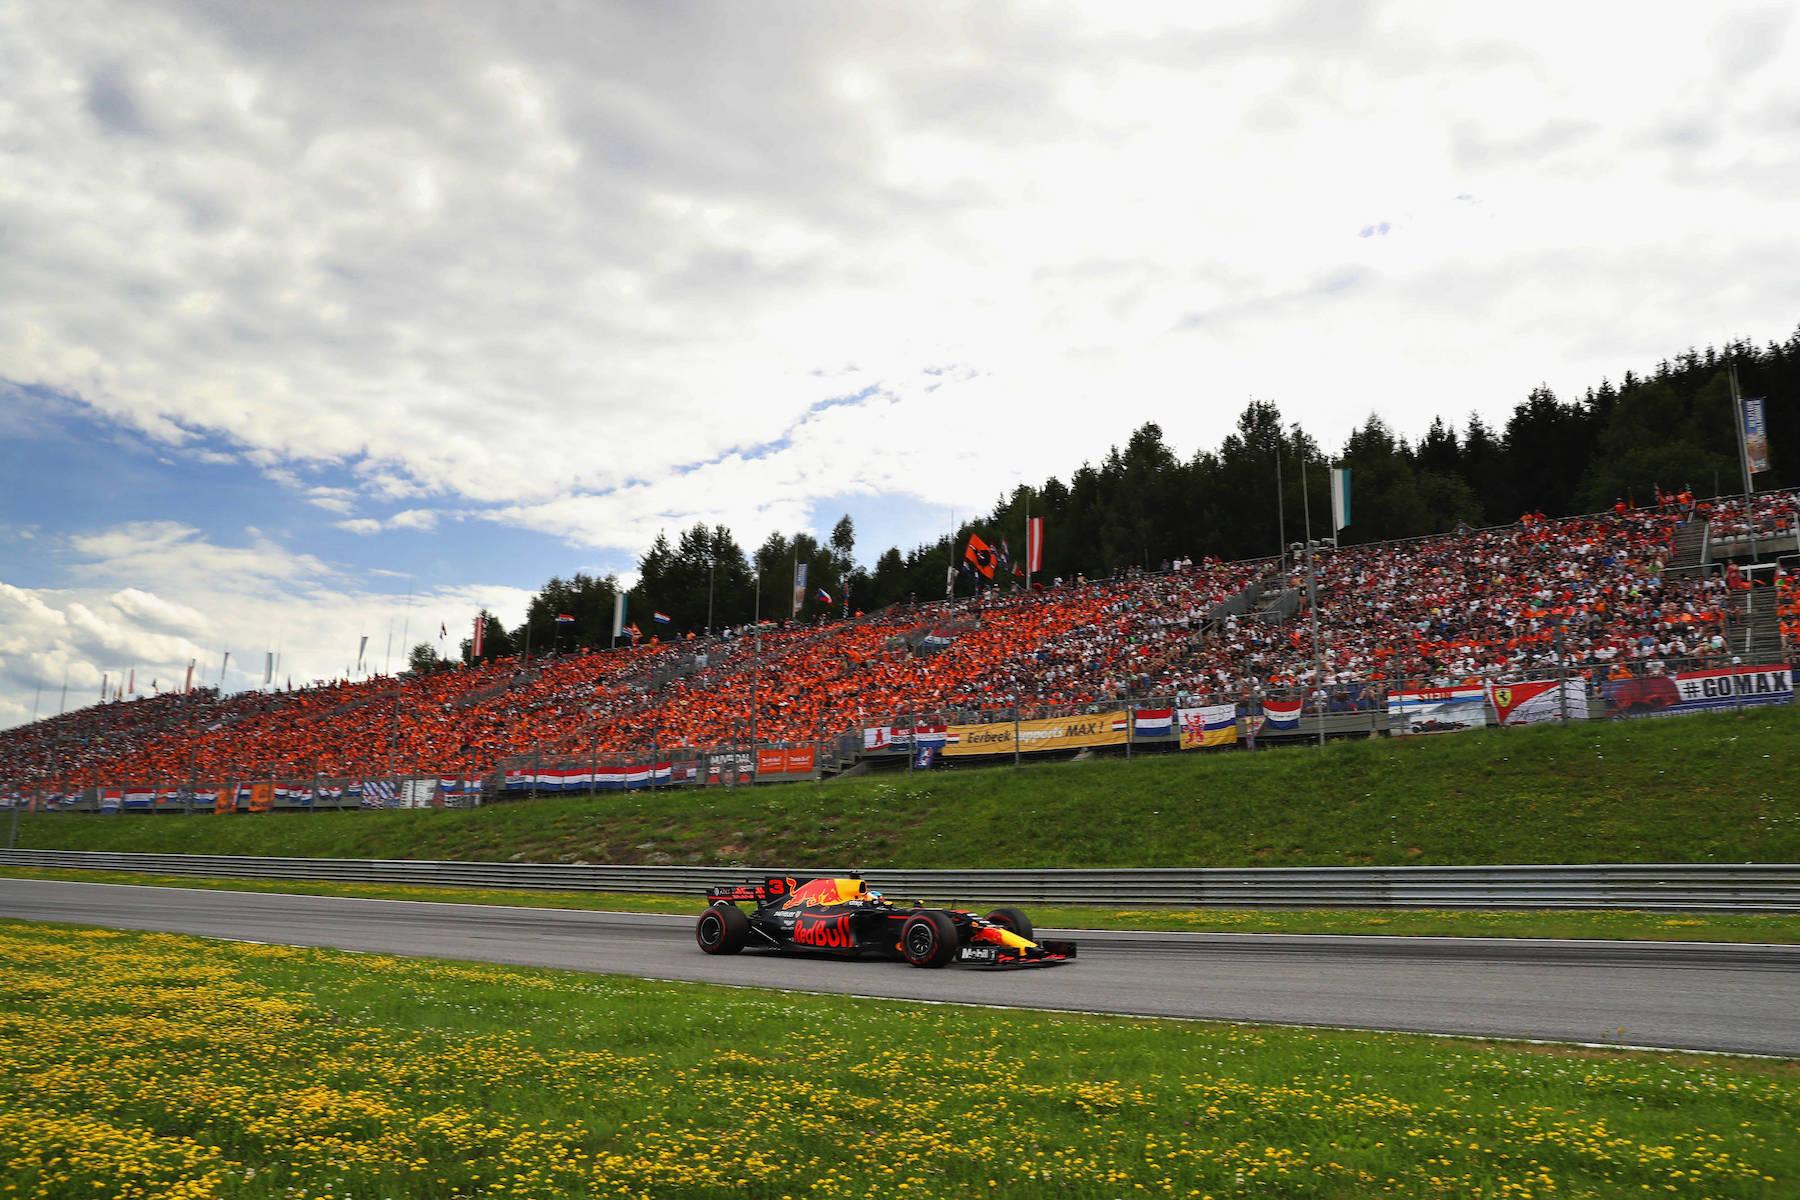 G 2017 Daniel Ricciardo | Red Bull RB13 | 2017 Austrian GP P3 3 copy.jpg